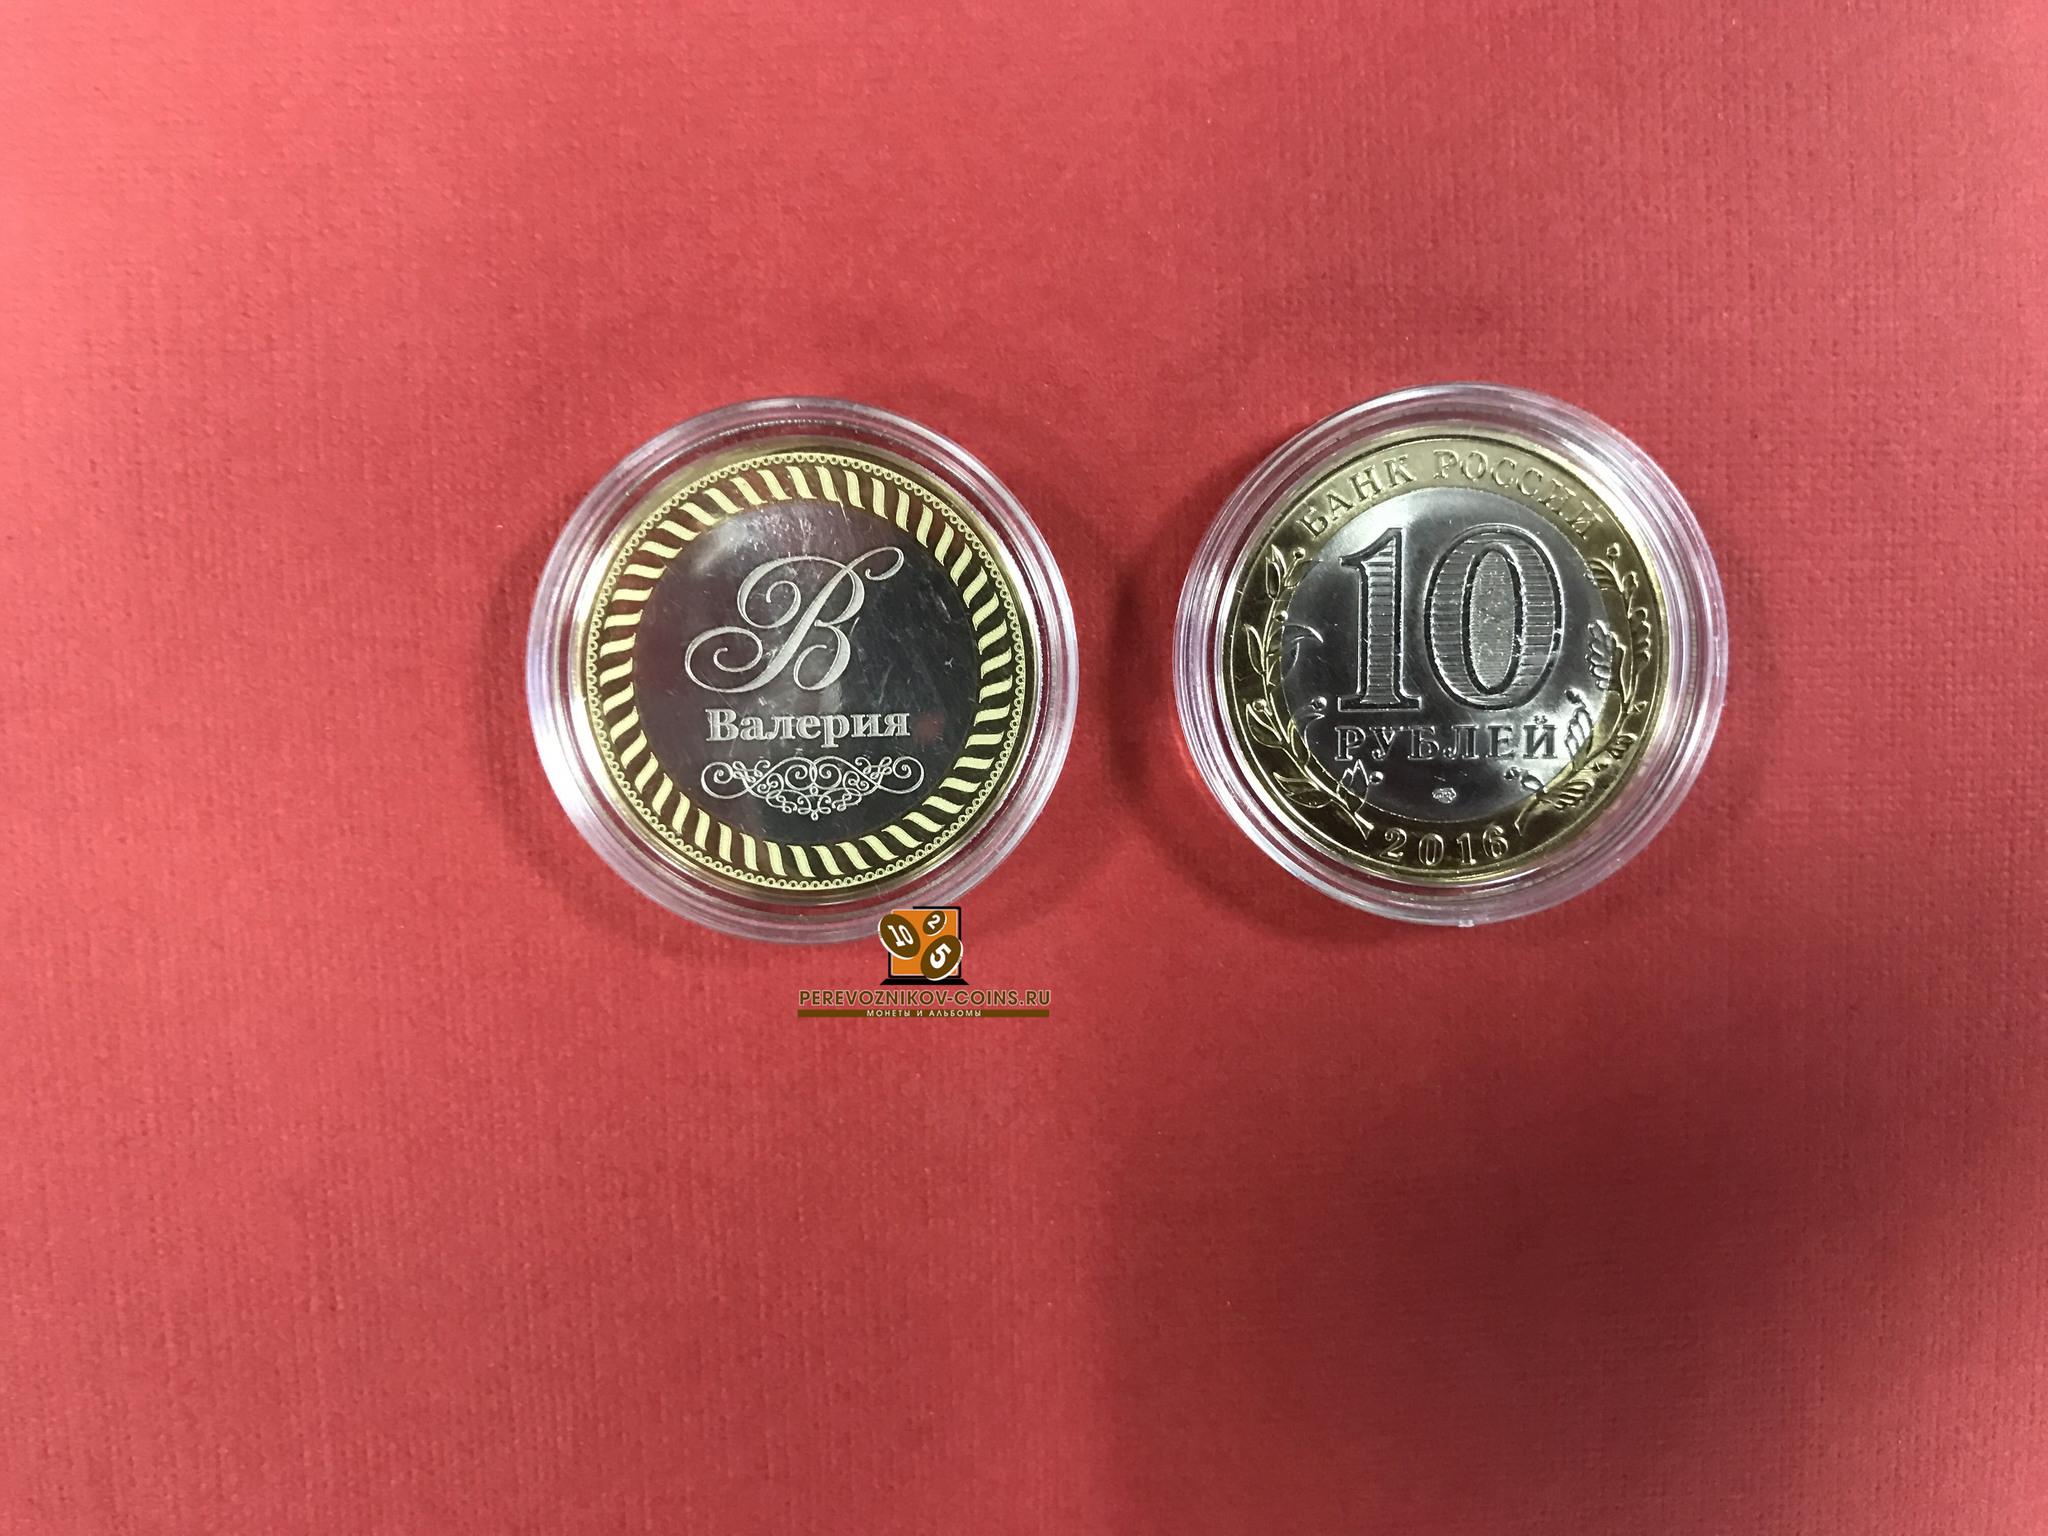 Валерия. Гравированная монета 10 рублей